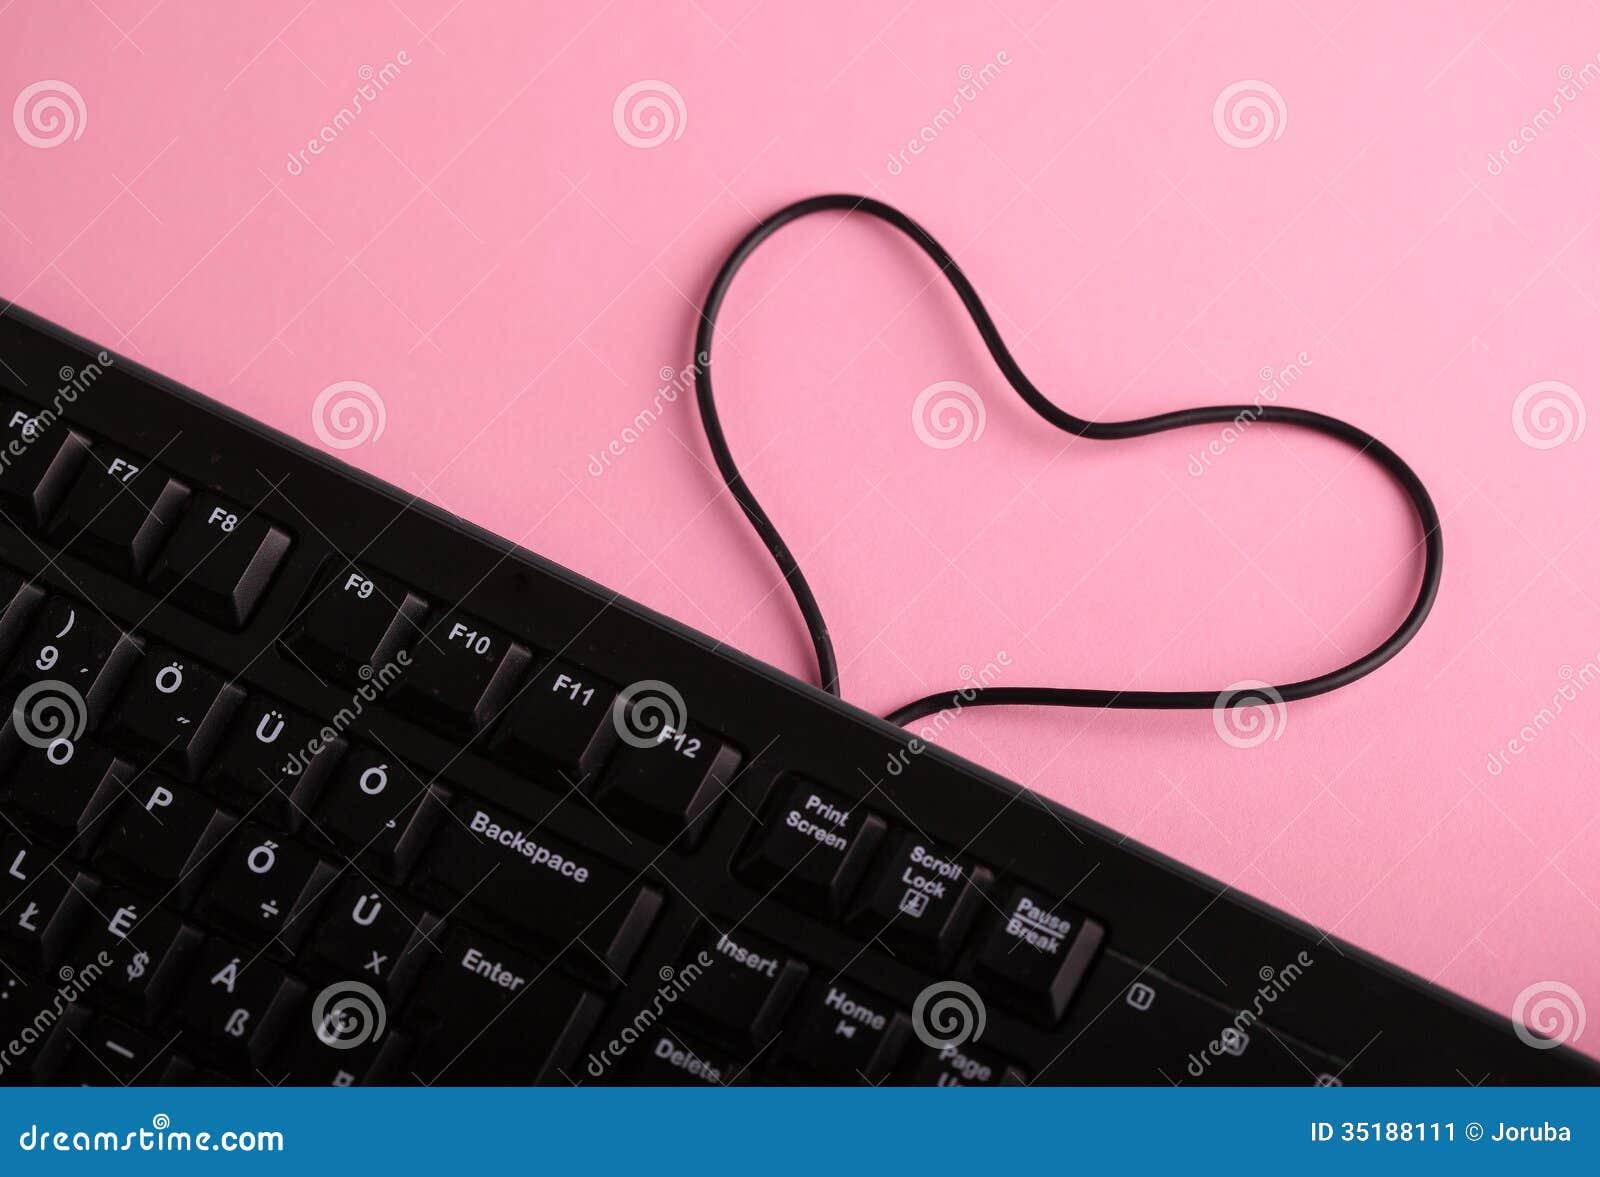 Heart shaped keyboard symbol images symbols and meanings love on internet stock image image of february cable 35188111 royalty free stock photo biocorpaavc images buycottarizona Choice Image